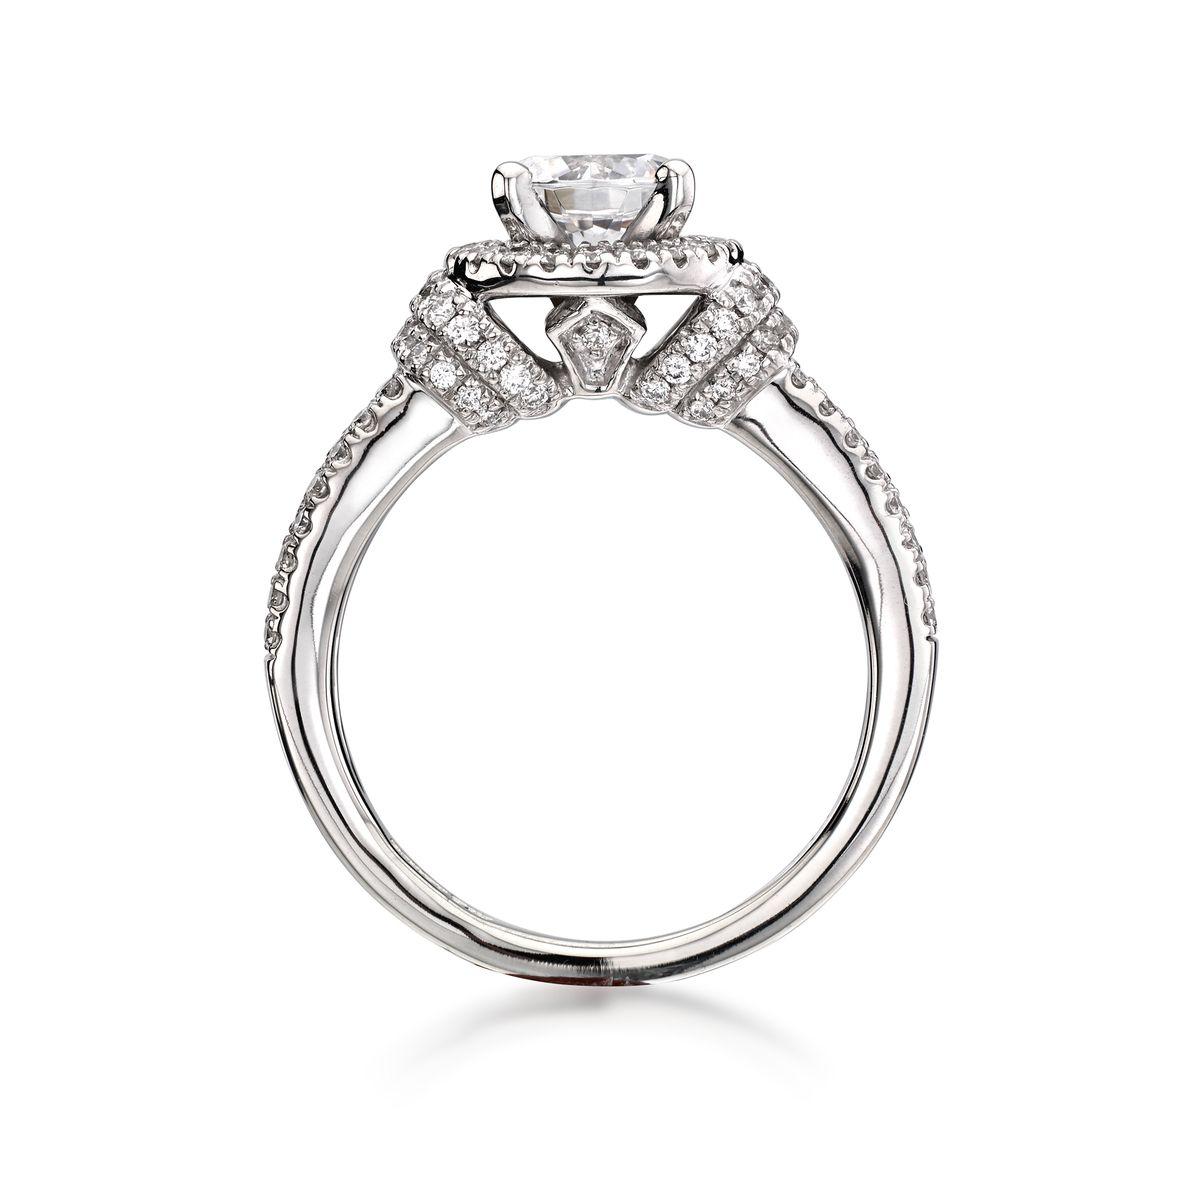 Padis Gems San Francisco Scott Kay Scott Kay Jewelry Jewelry Engagement Rings